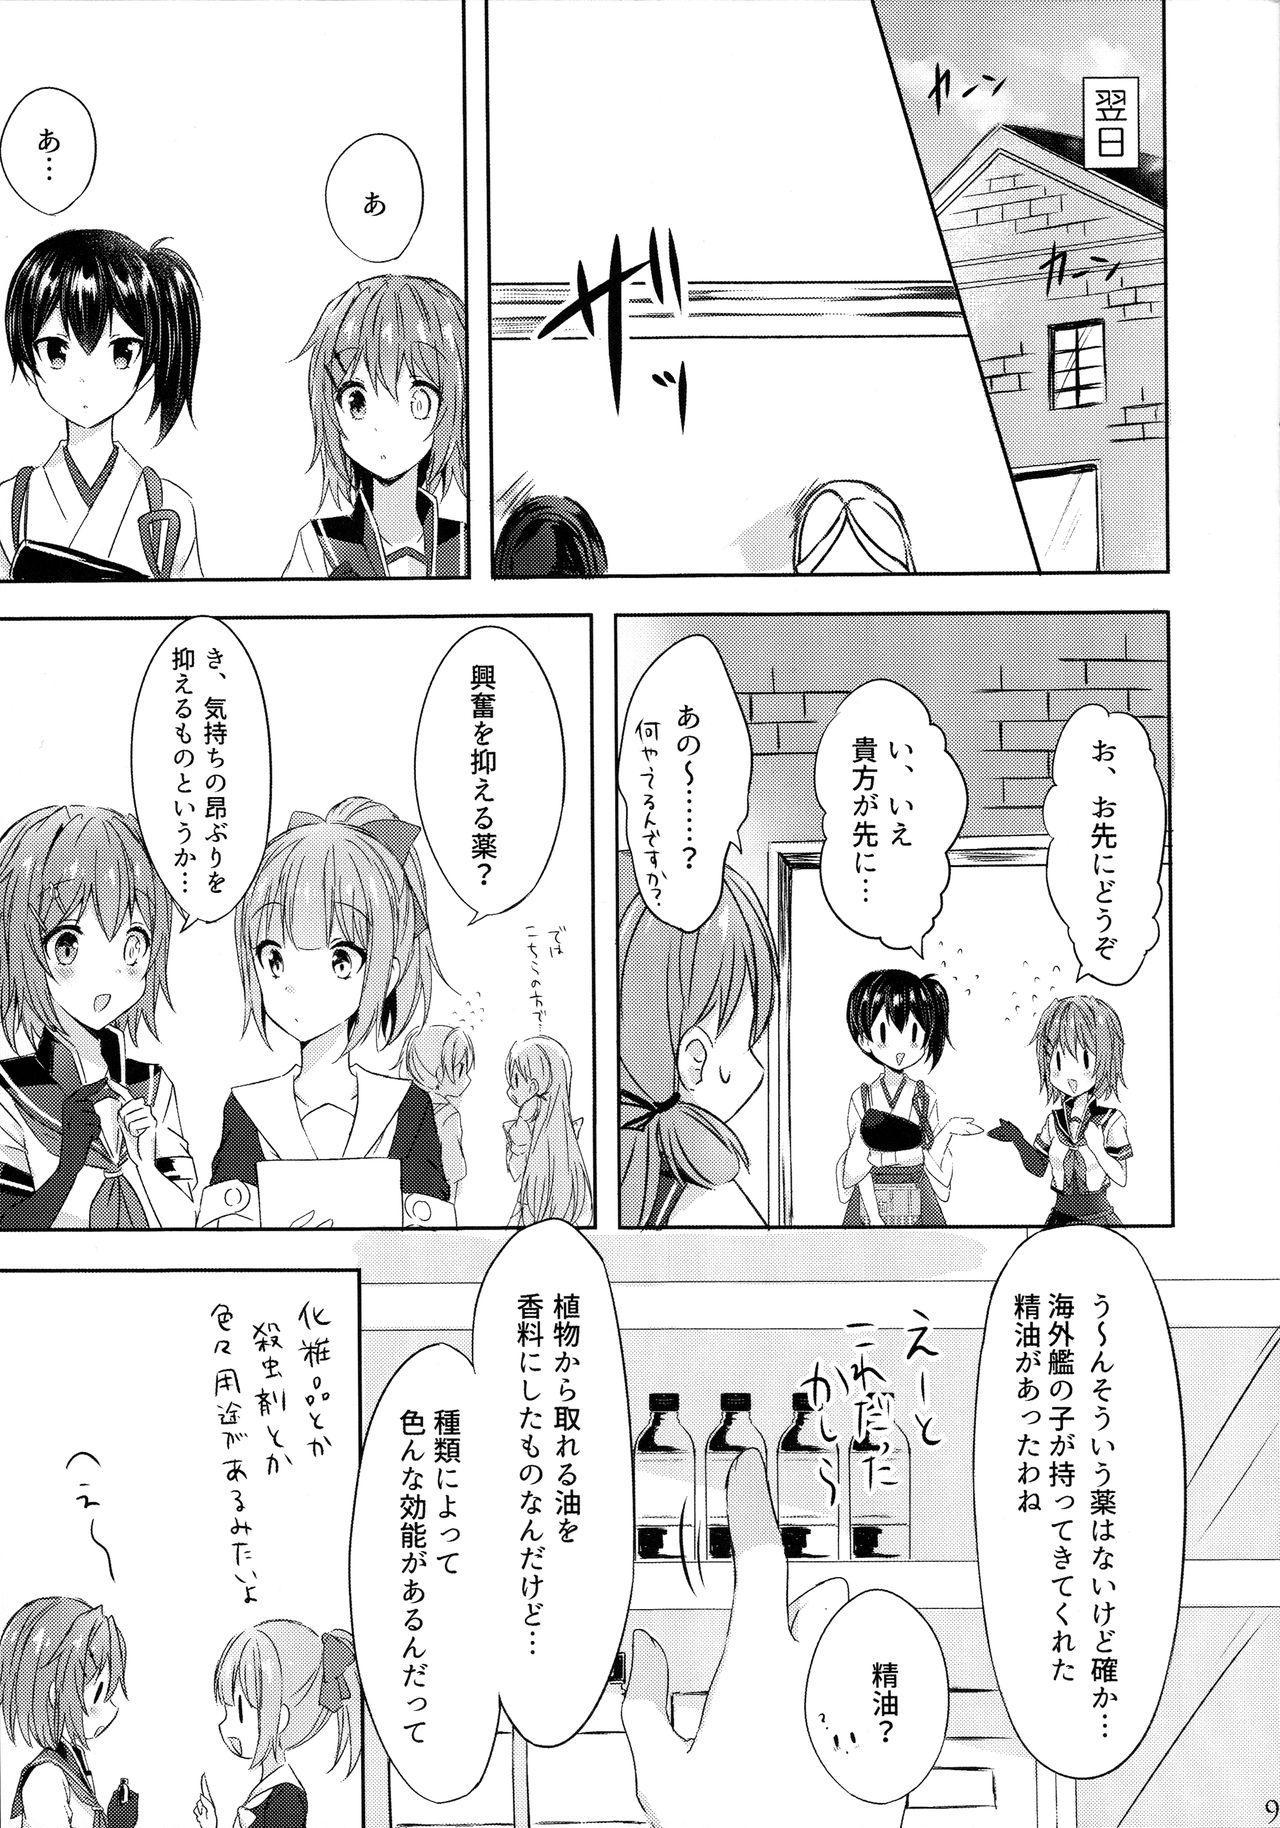 Toaru Koibito-tachi no Futari Ecchi 8